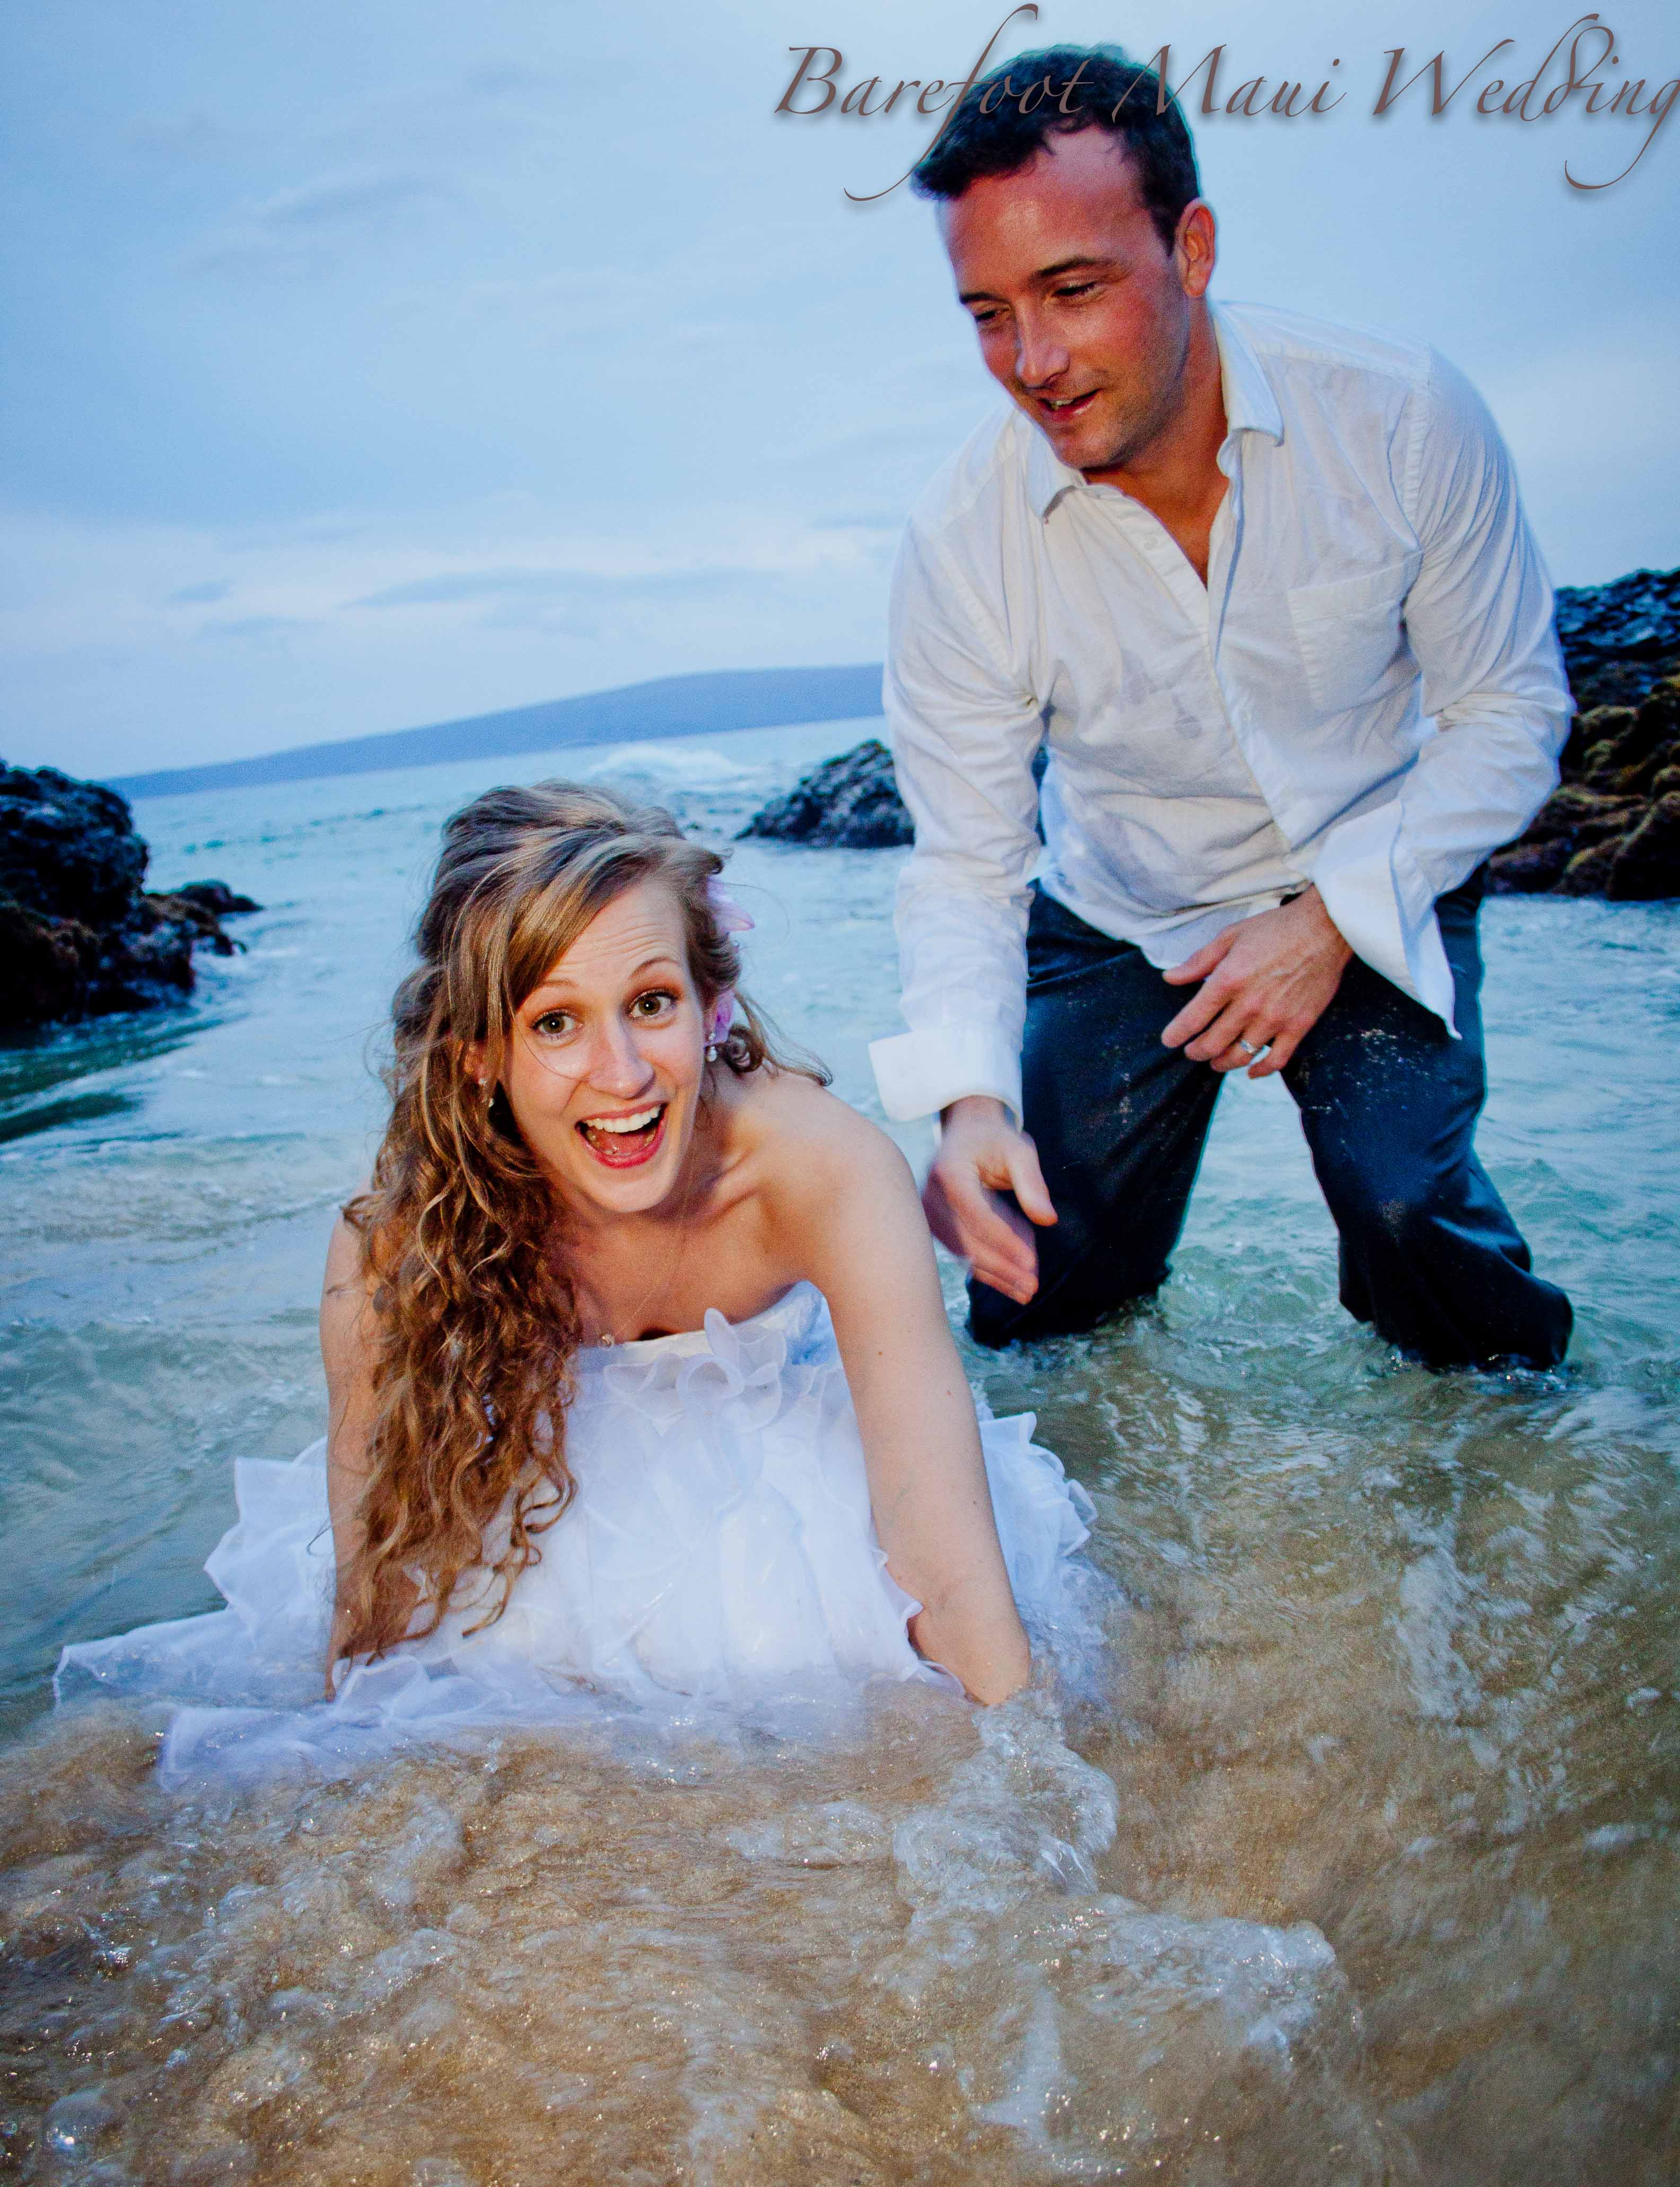 Barefoot Maui Wedding Fun PHotography-18